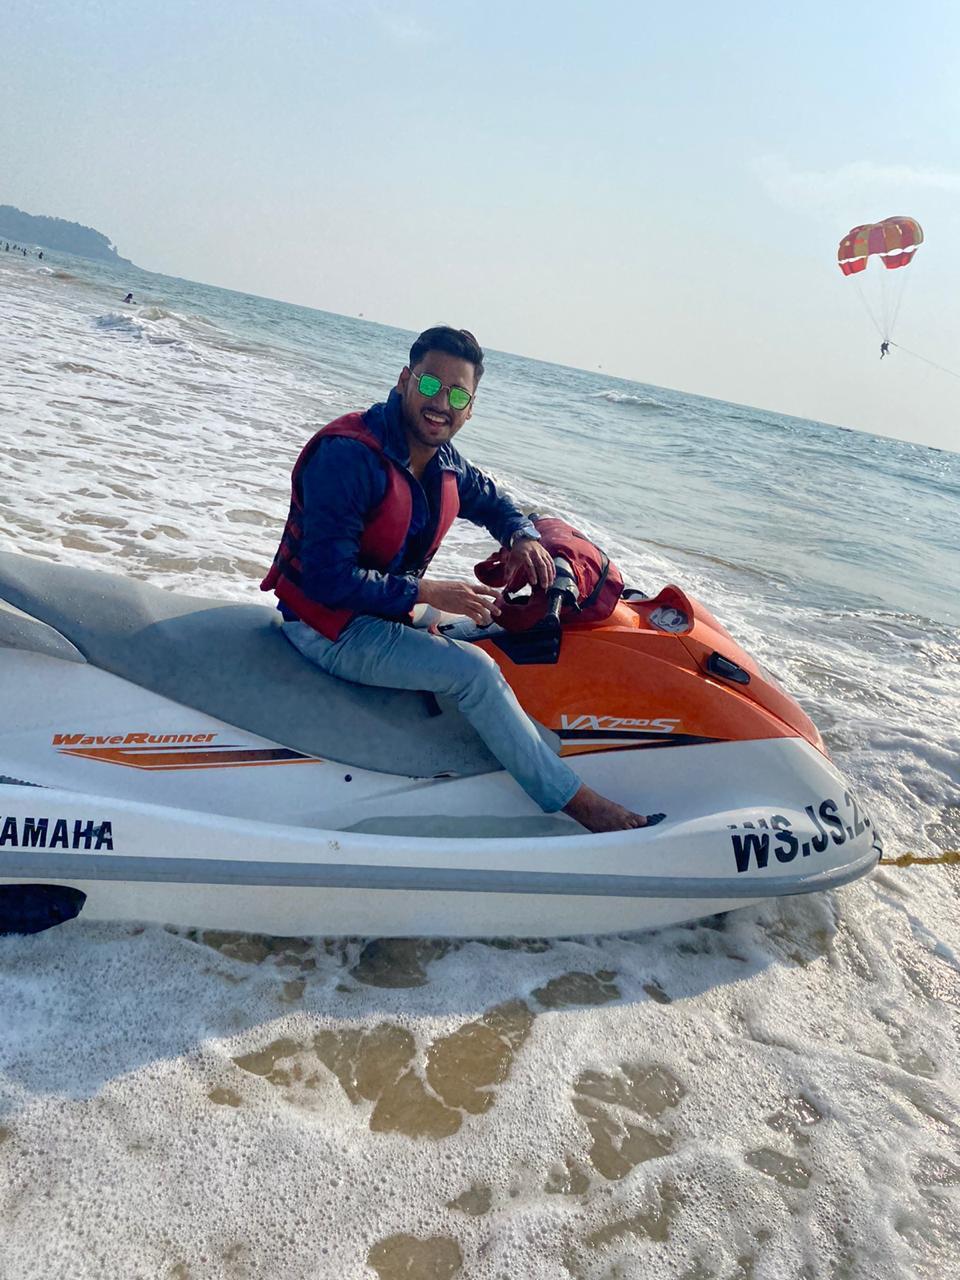 Hyderabad based entrepreneur Shaik Shoeb uddin is a versatile man